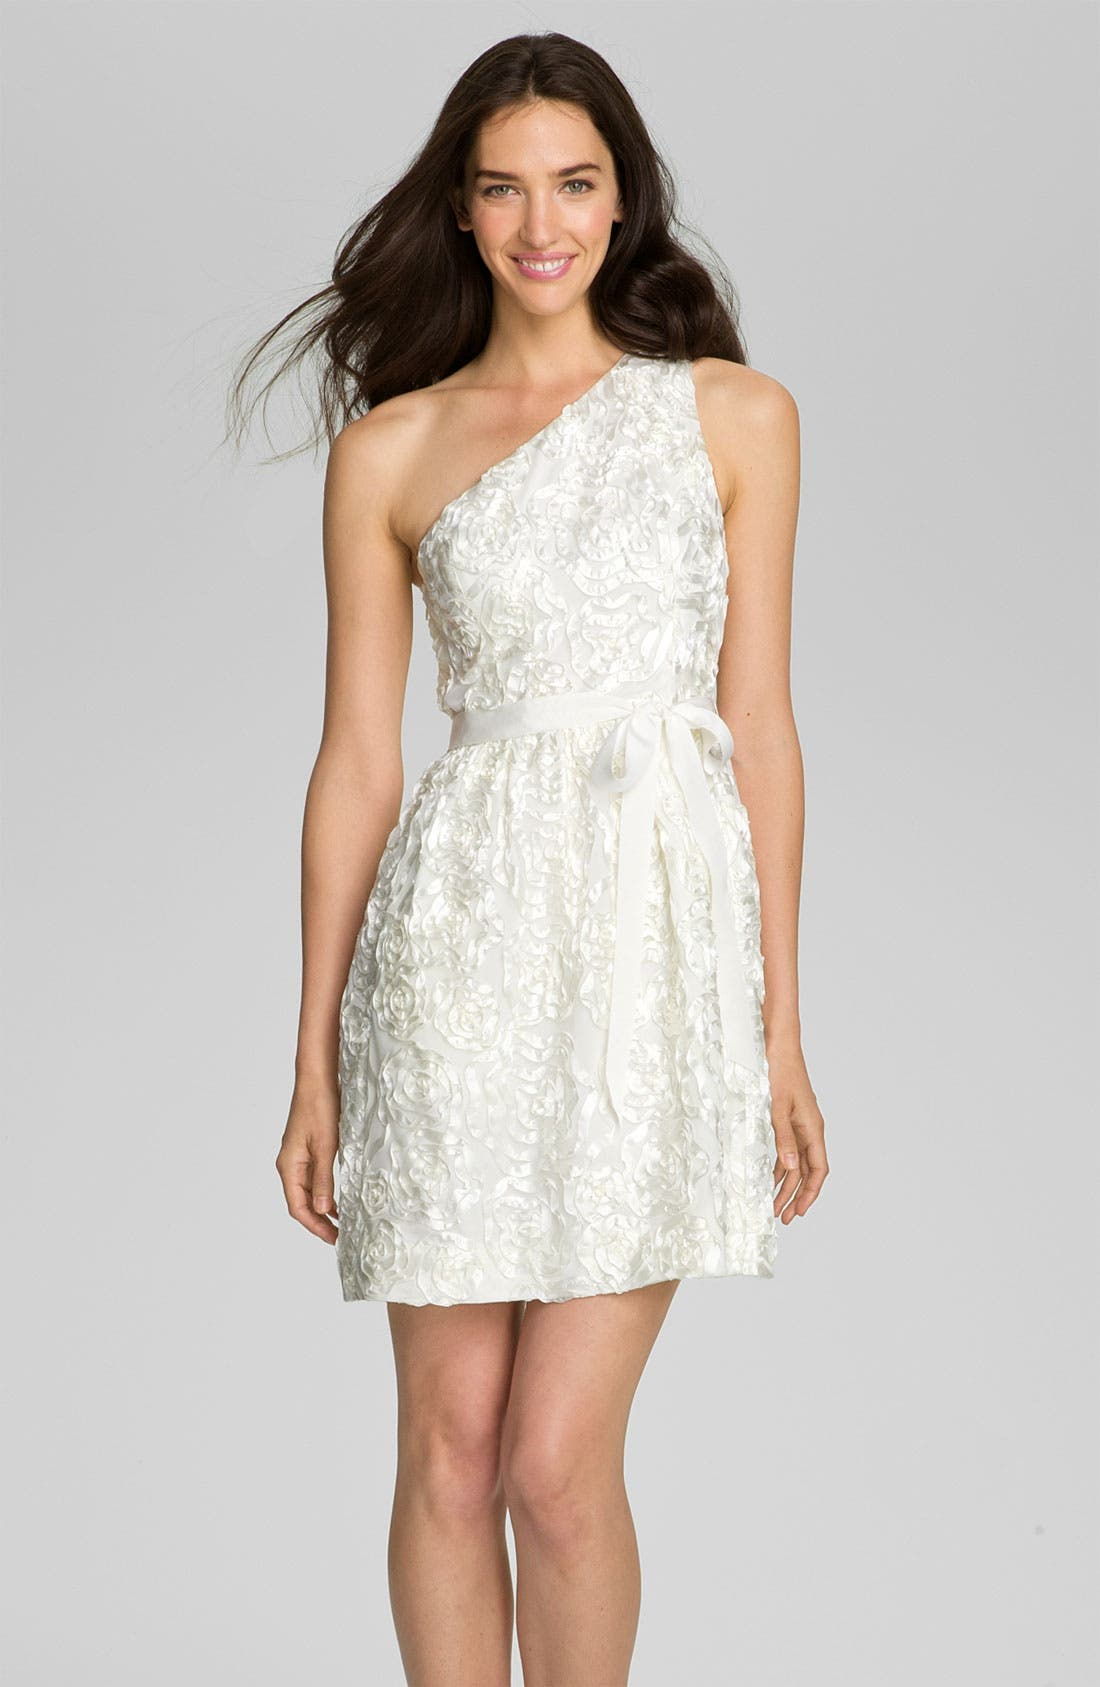 Alternate Image 1 Selected - Jill Stuart One Shoulder Soutache Tulle Dress